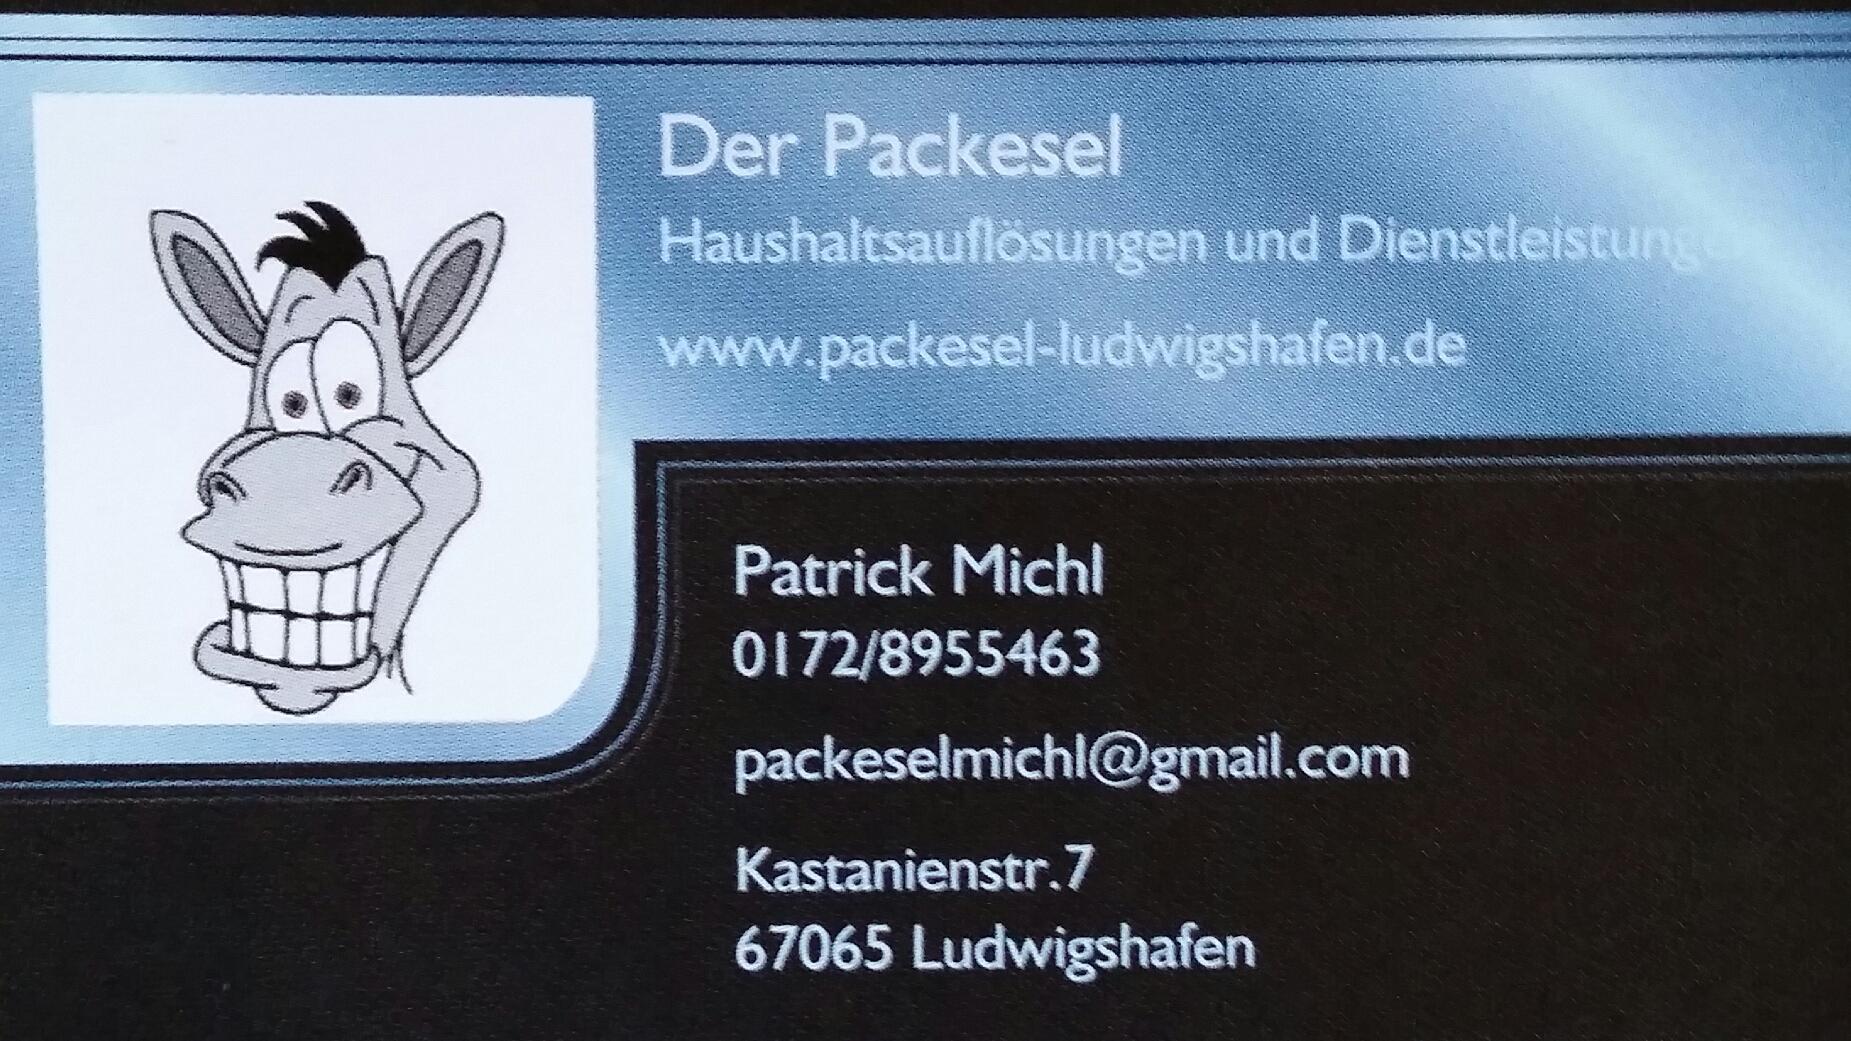 Der Packesel Ludwigshafen